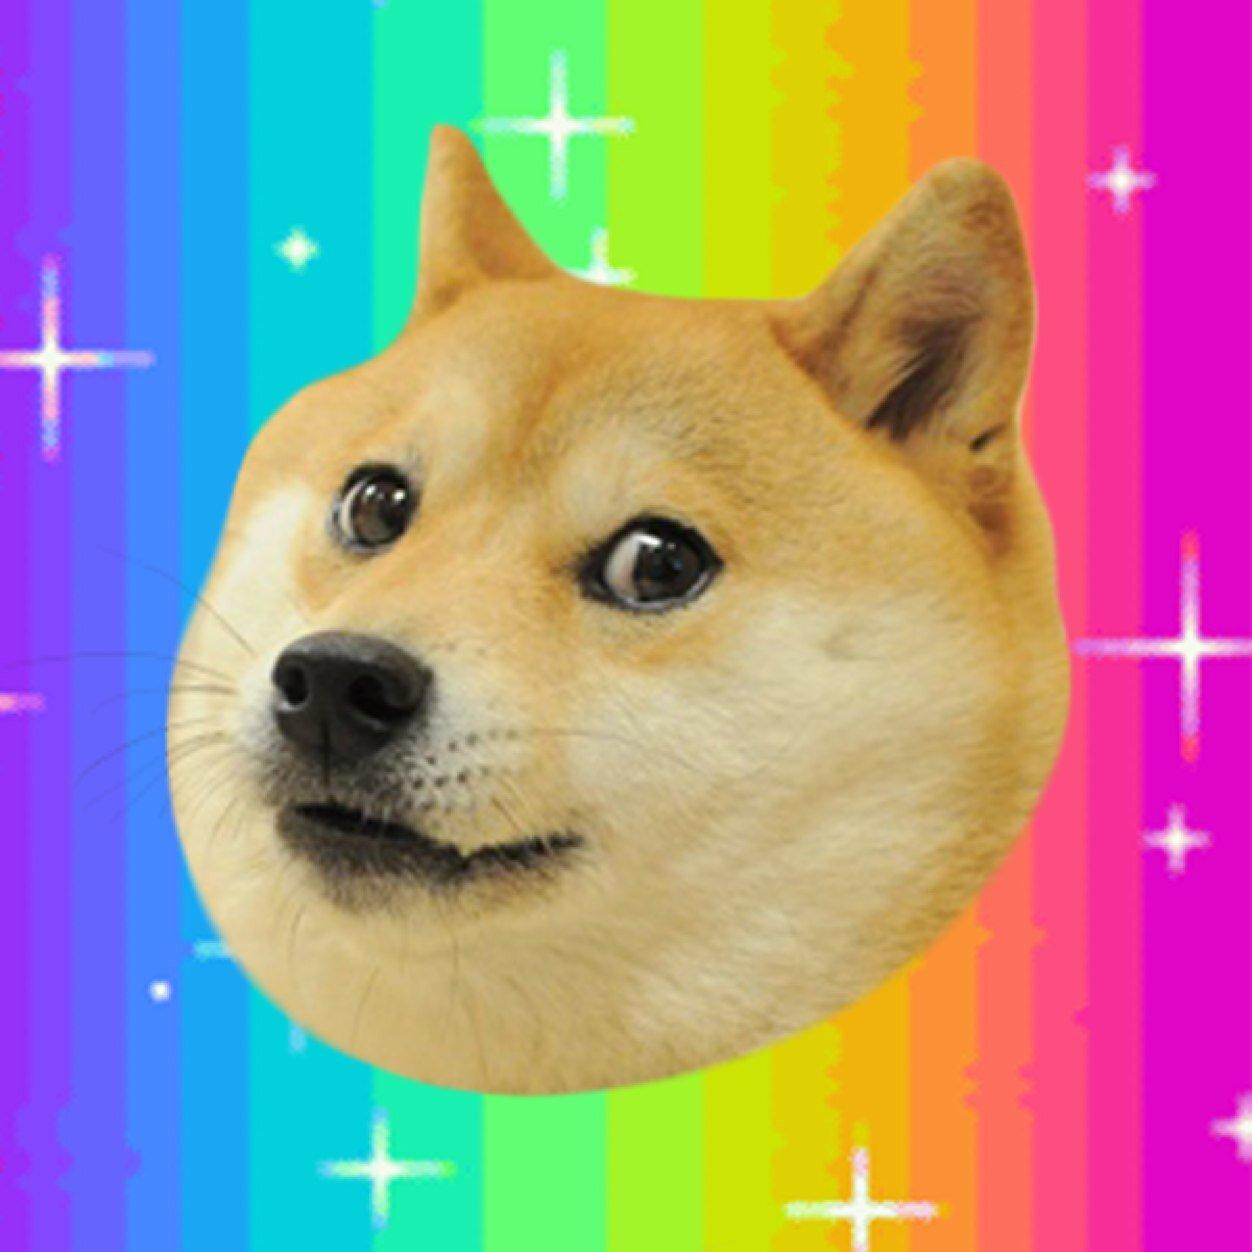 doge atnarcolepticdog twitter